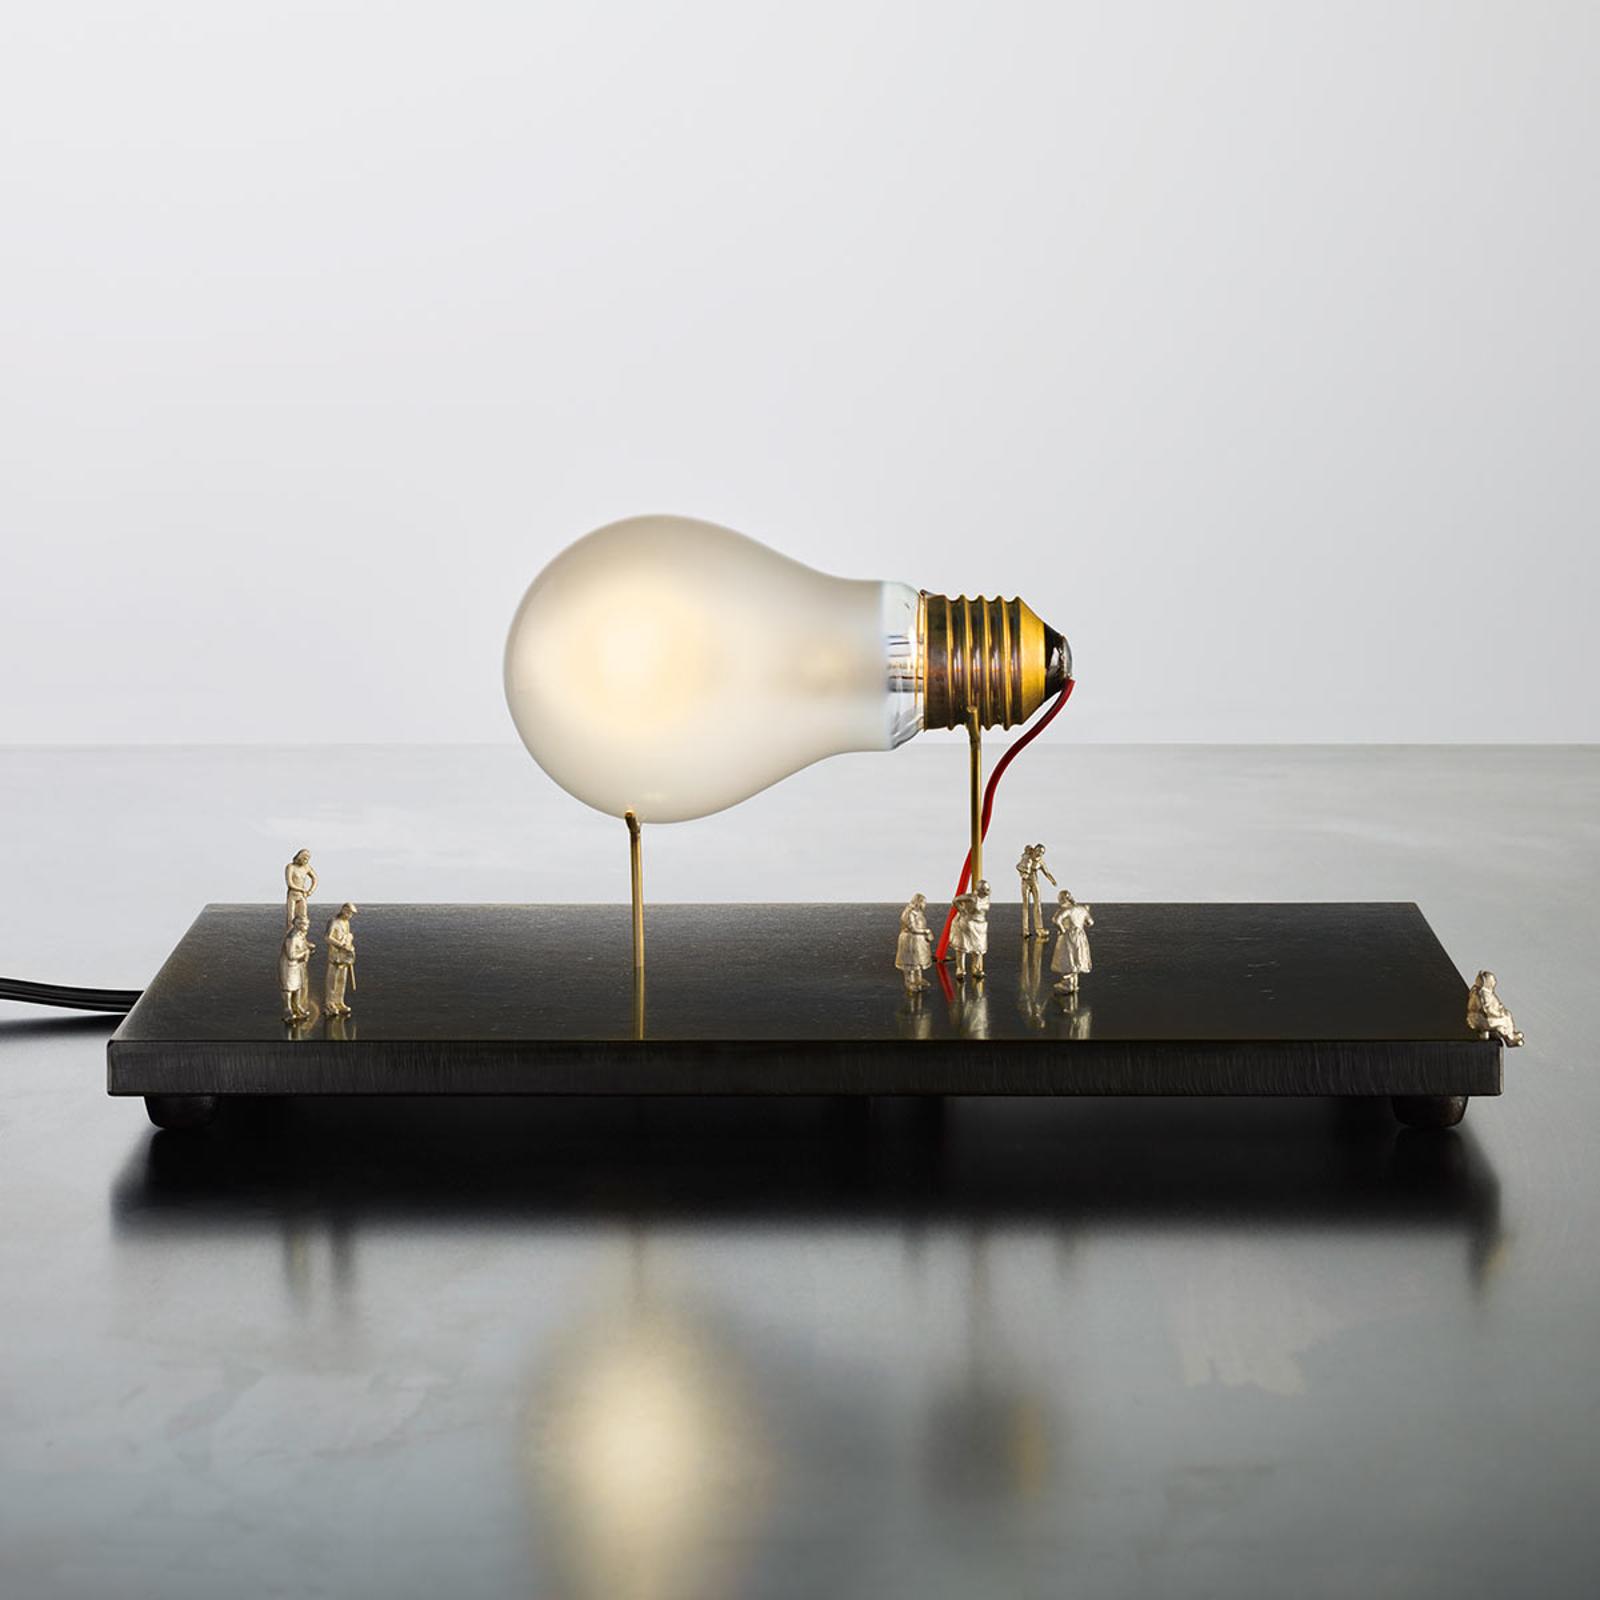 Lampa stołowa I Ricchi Poveri Monument for a Bulb